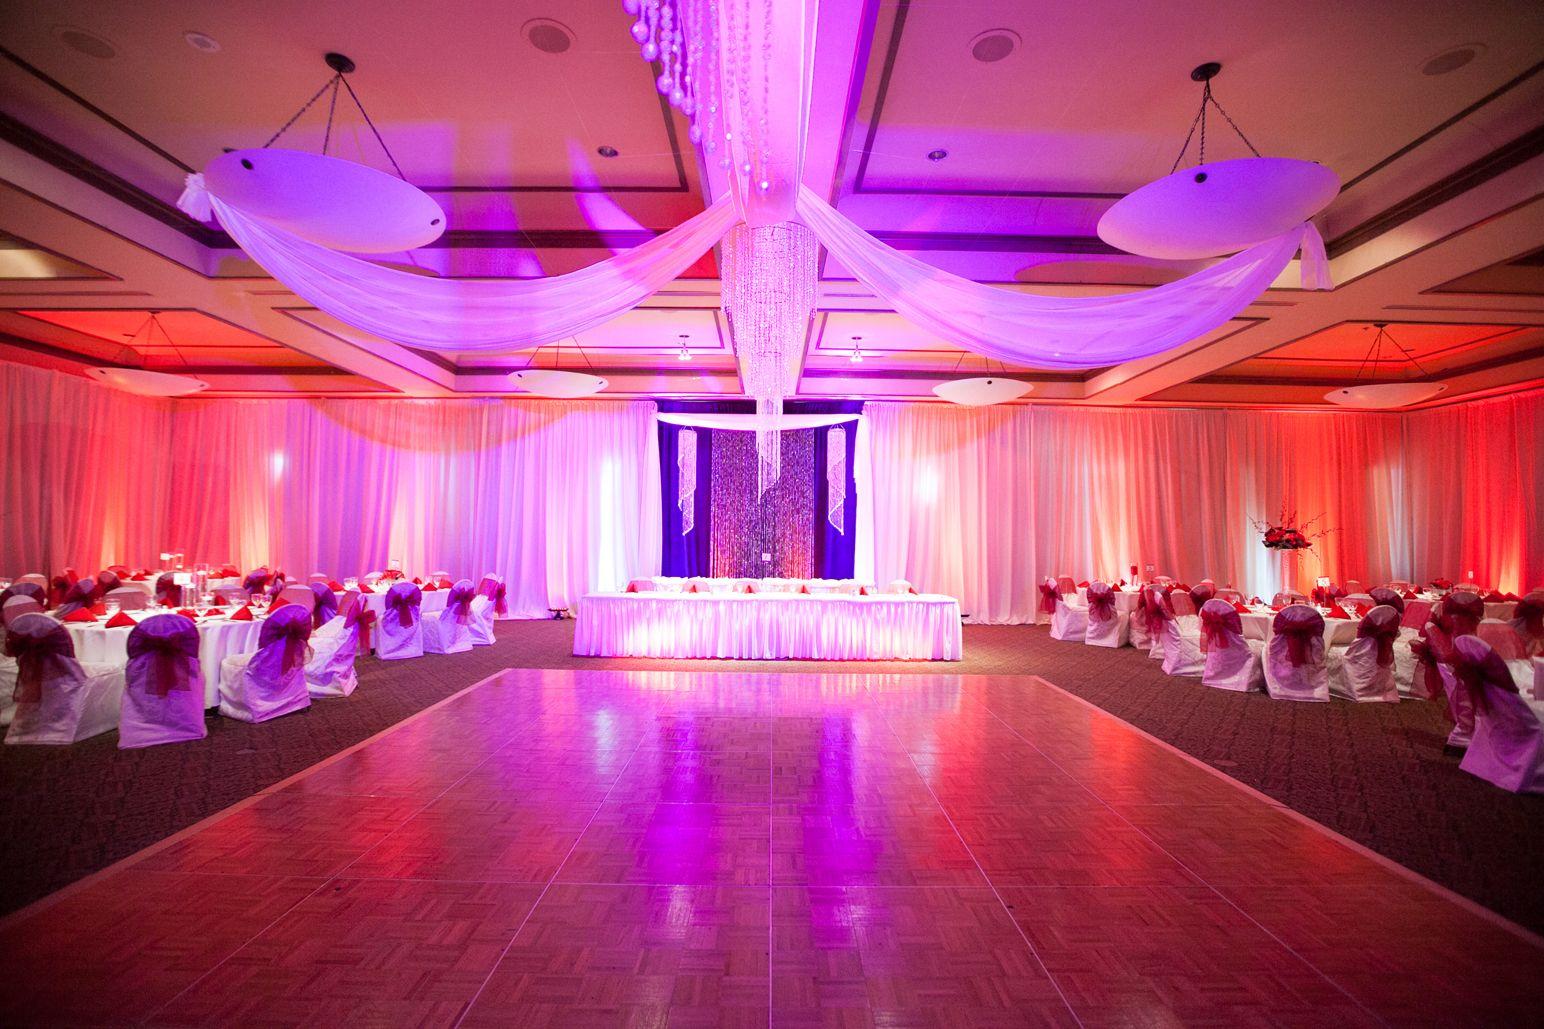 Dfw Perfect Wedding Guide Reception Venue Eldorado Country Club Dance